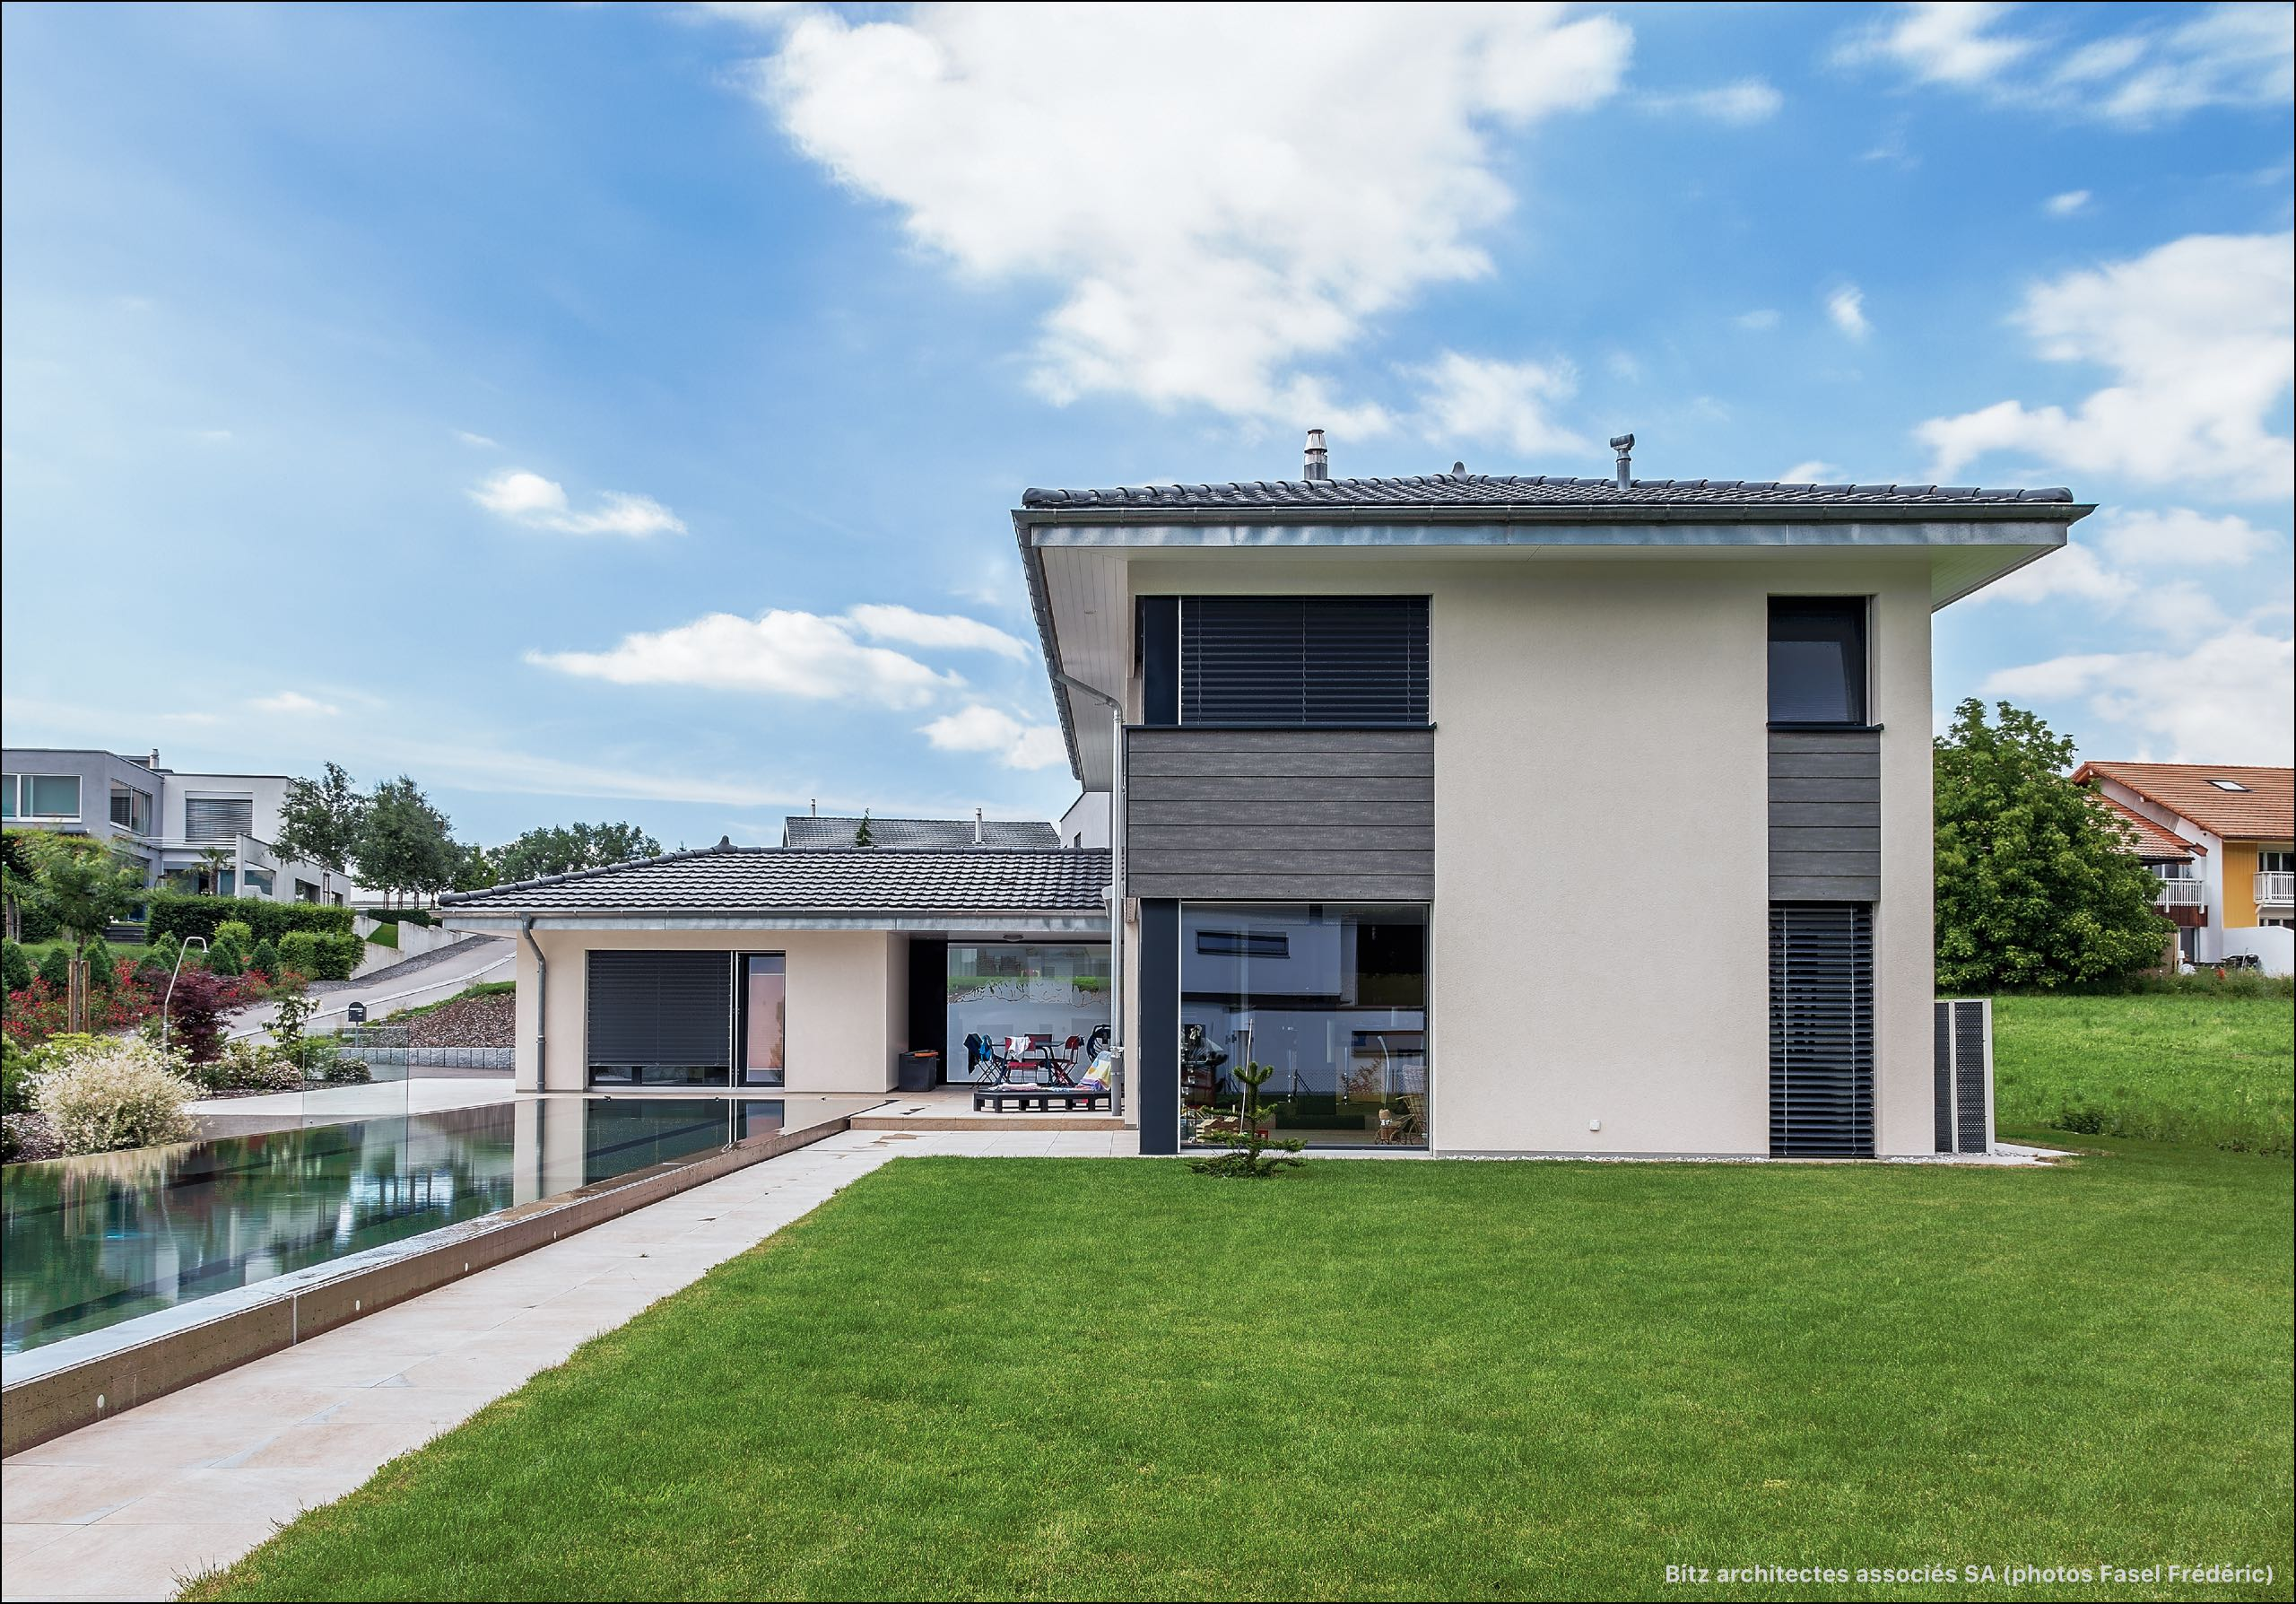 Zob bu habitation avec piscine de 25m bulle for Construction piscine 25m